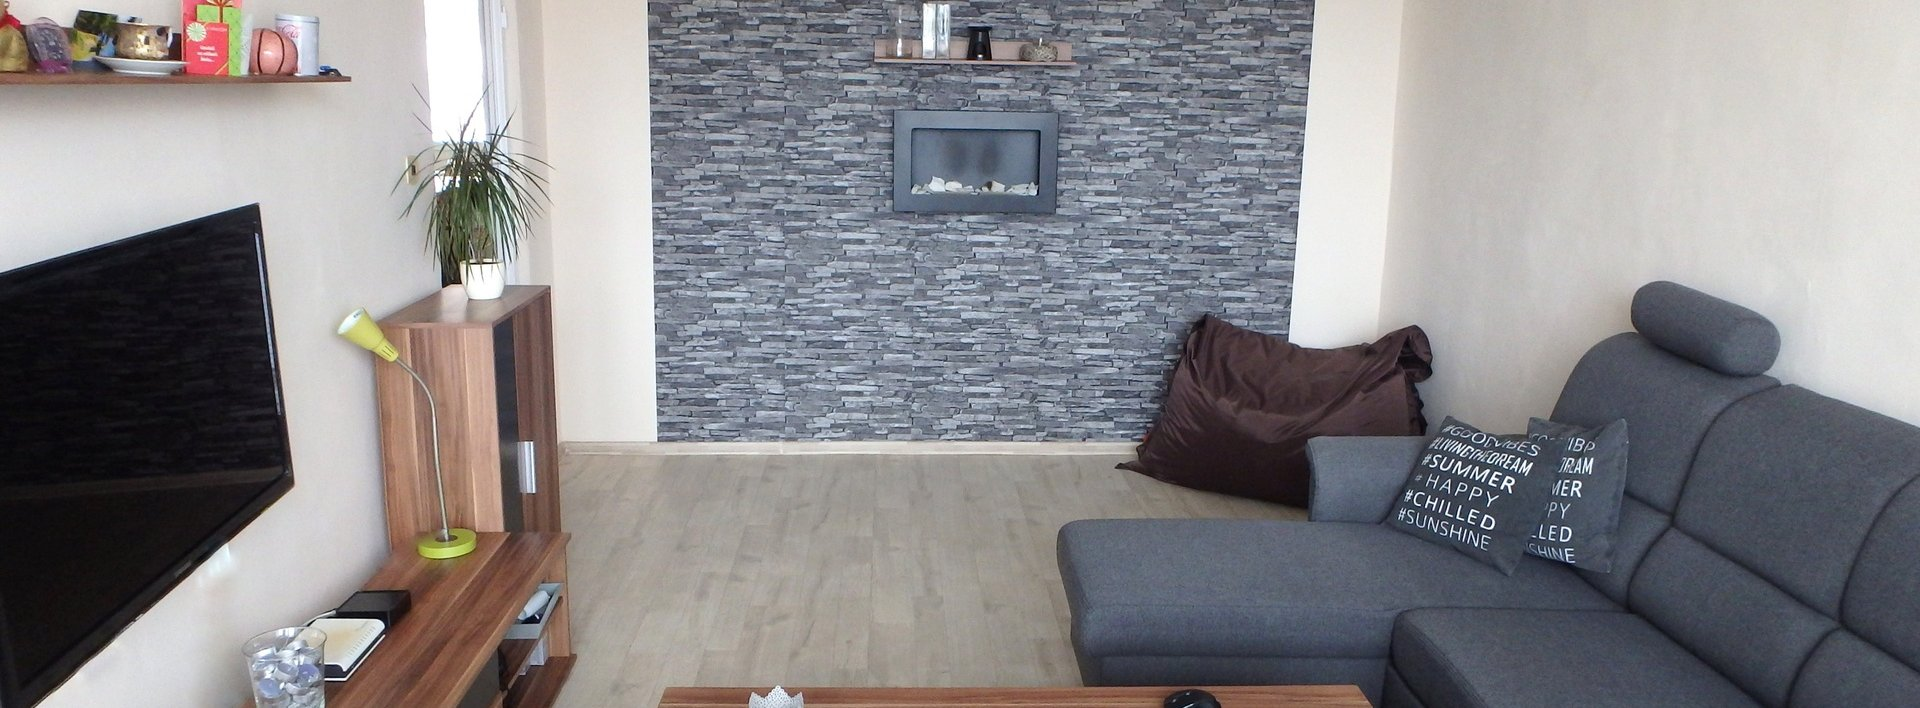 Prodej bytu 2+1 s lodžií, 64 m² - Liberec-Vratislavice n./N., Zámecký Vrch, Ev.č.: N48389